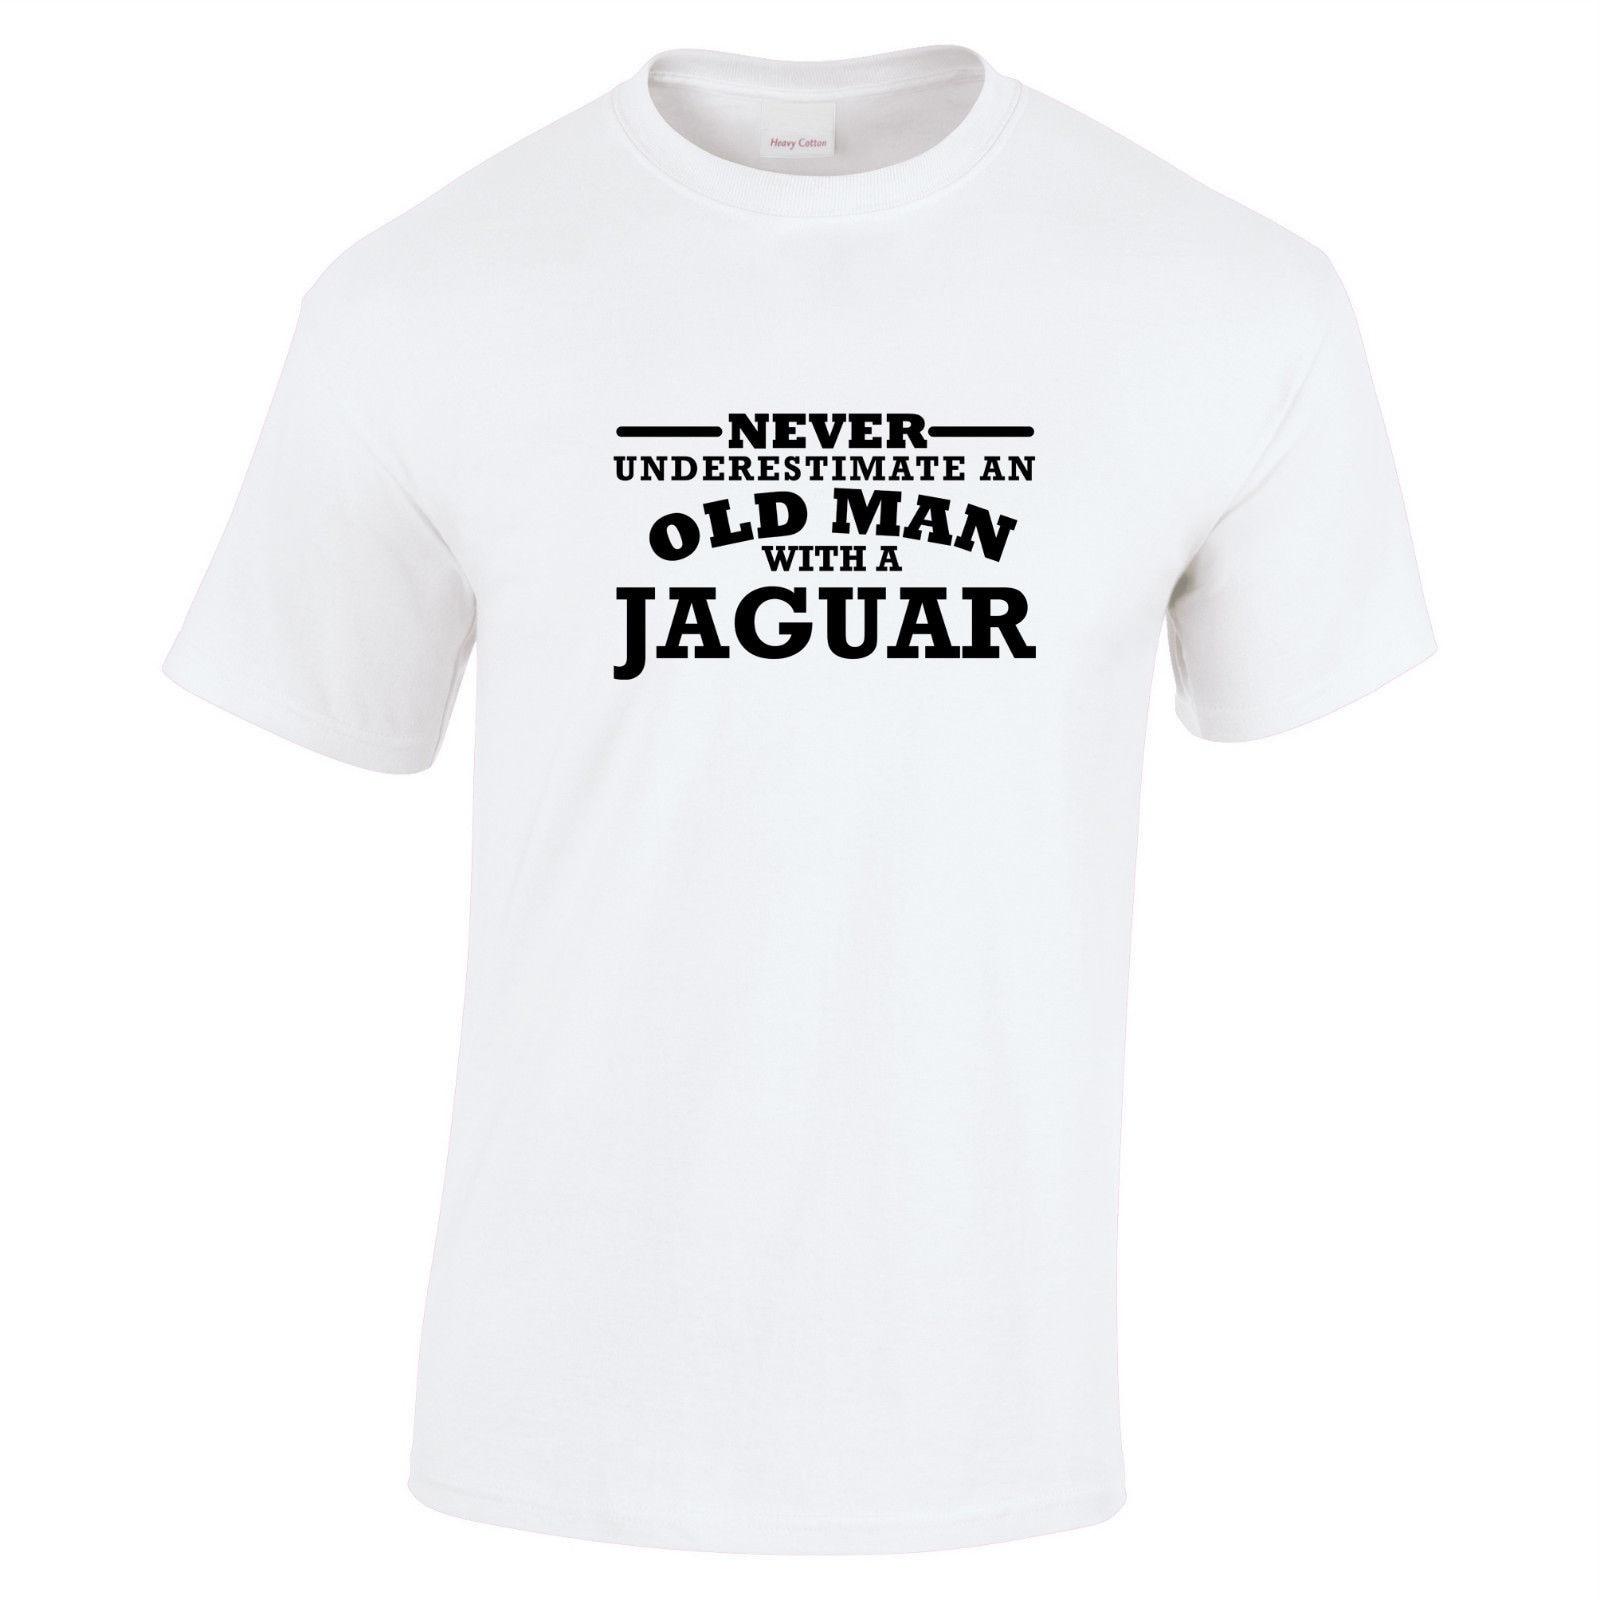 shirt shirts photos stunt team camp custom jaguar photo cheer design t ideas for